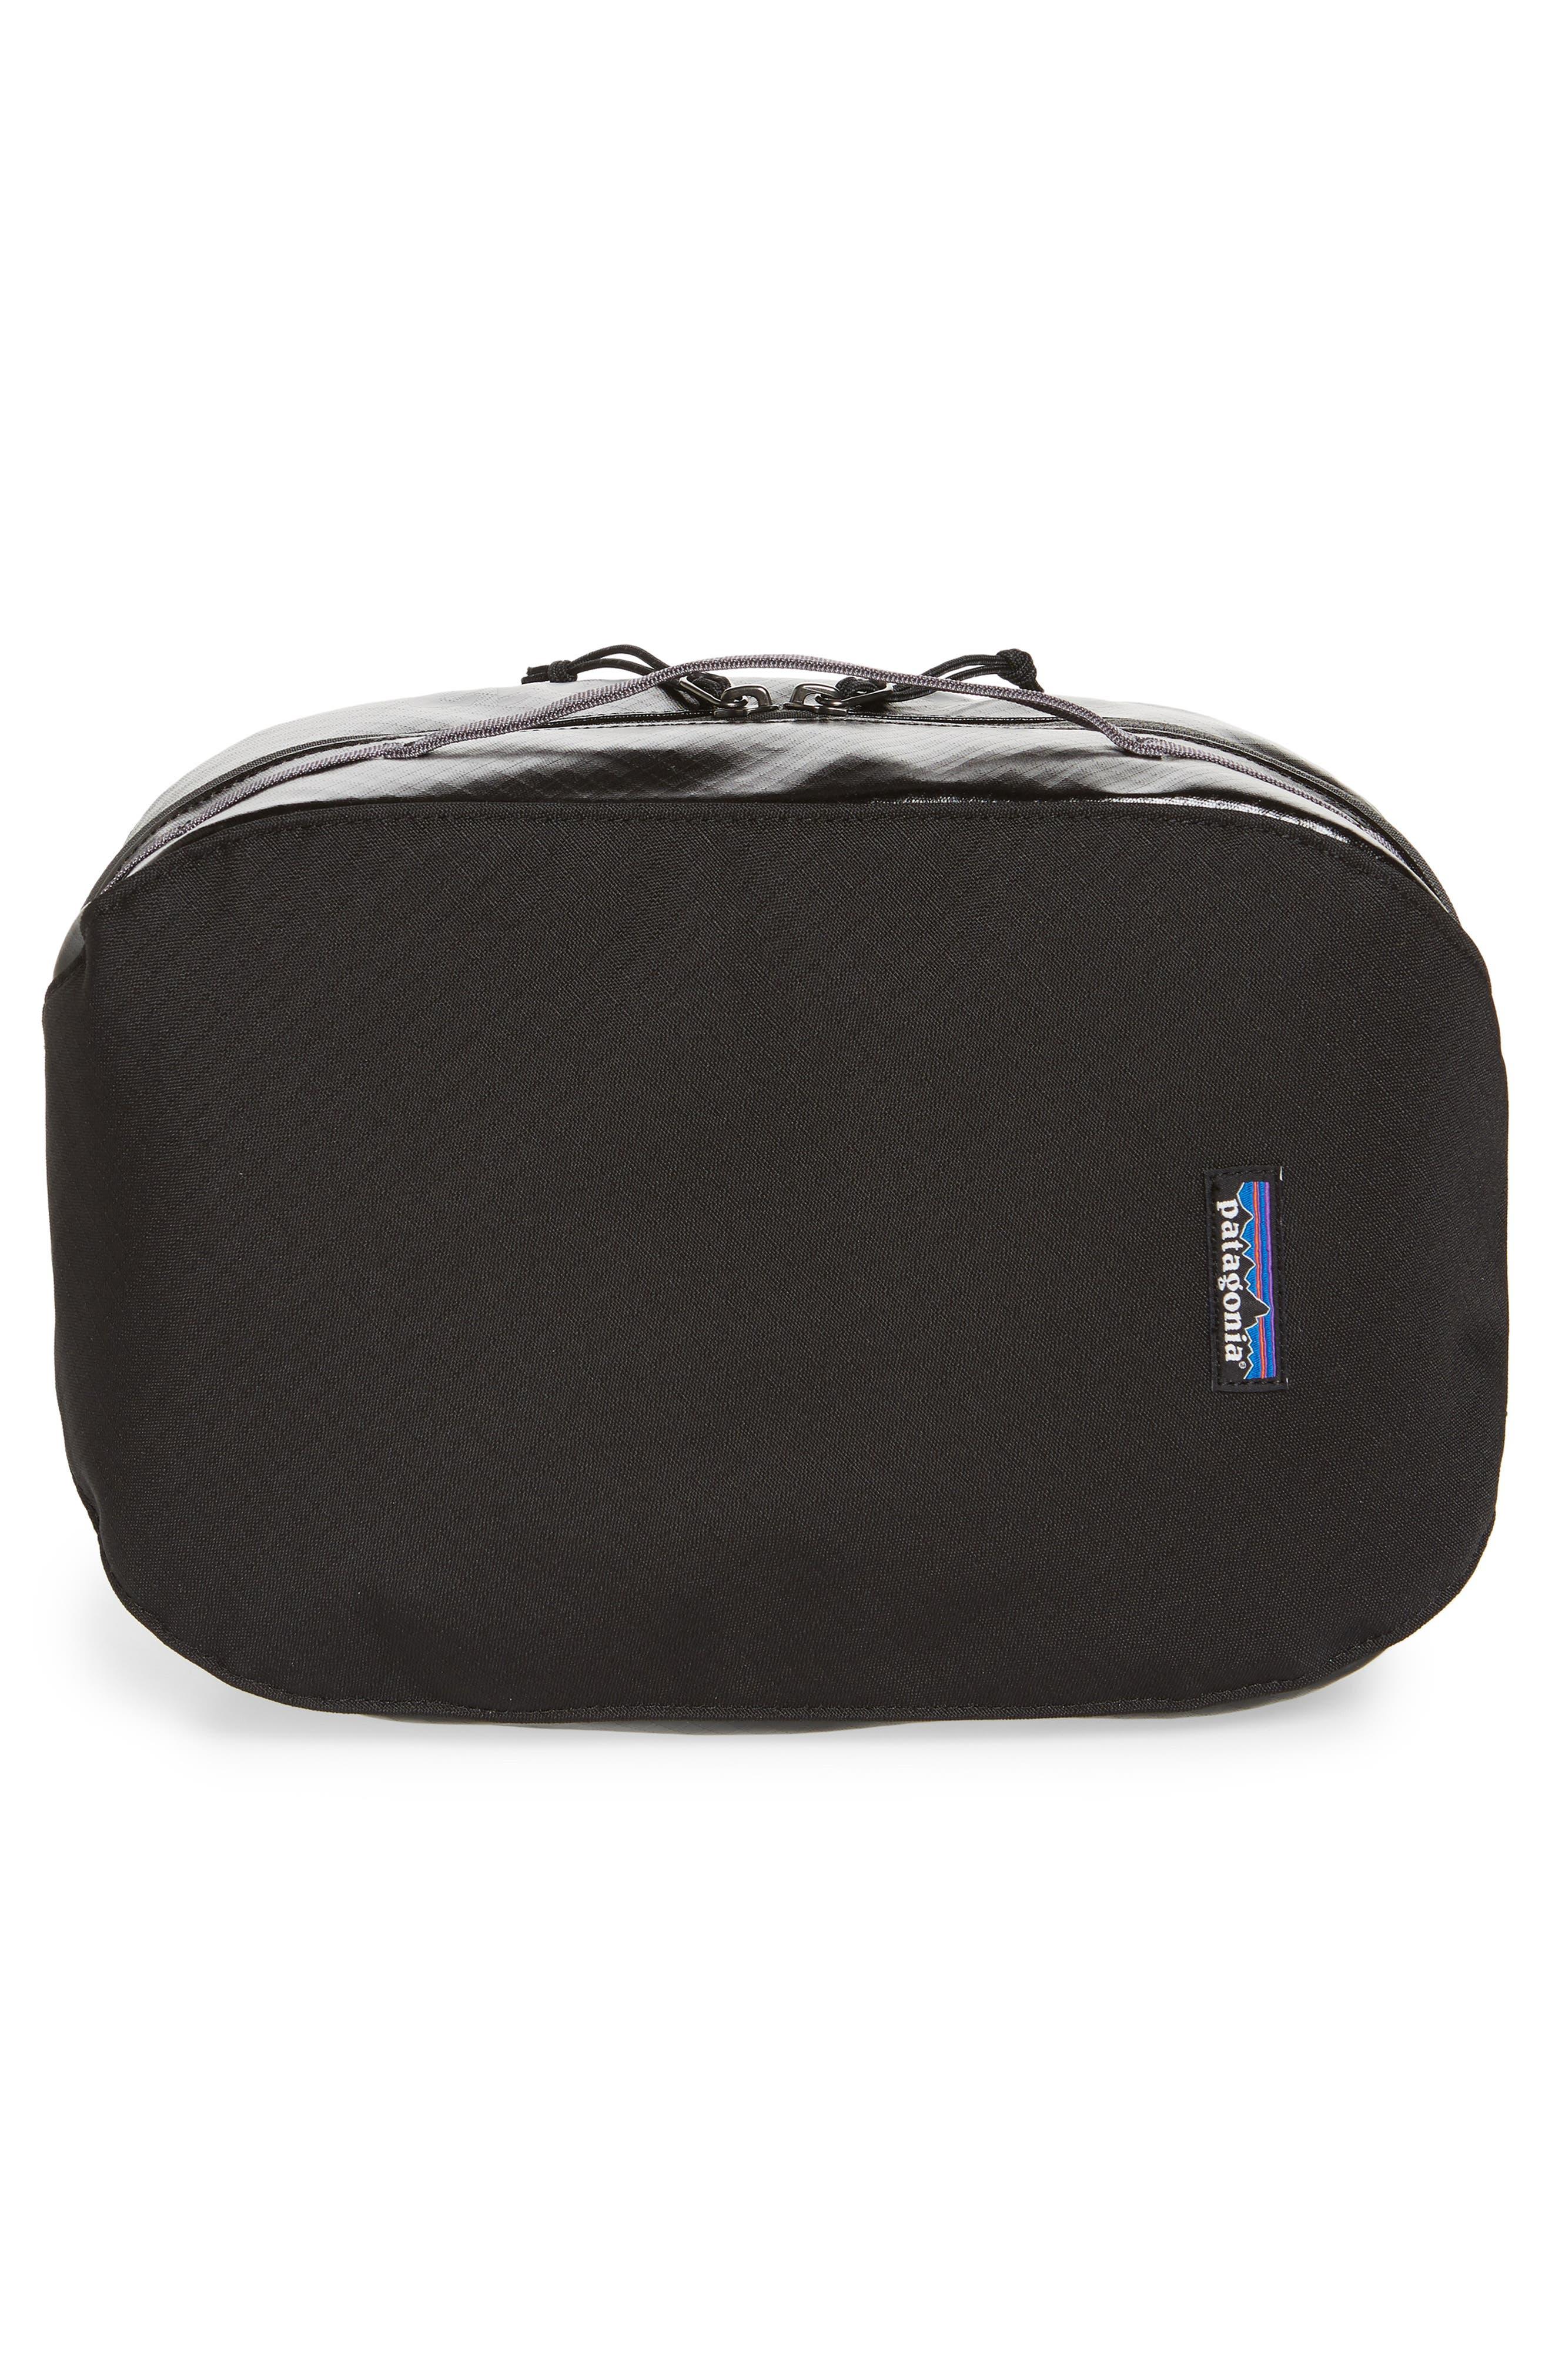 PATAGONIA Black Hole Cube Travel Kit